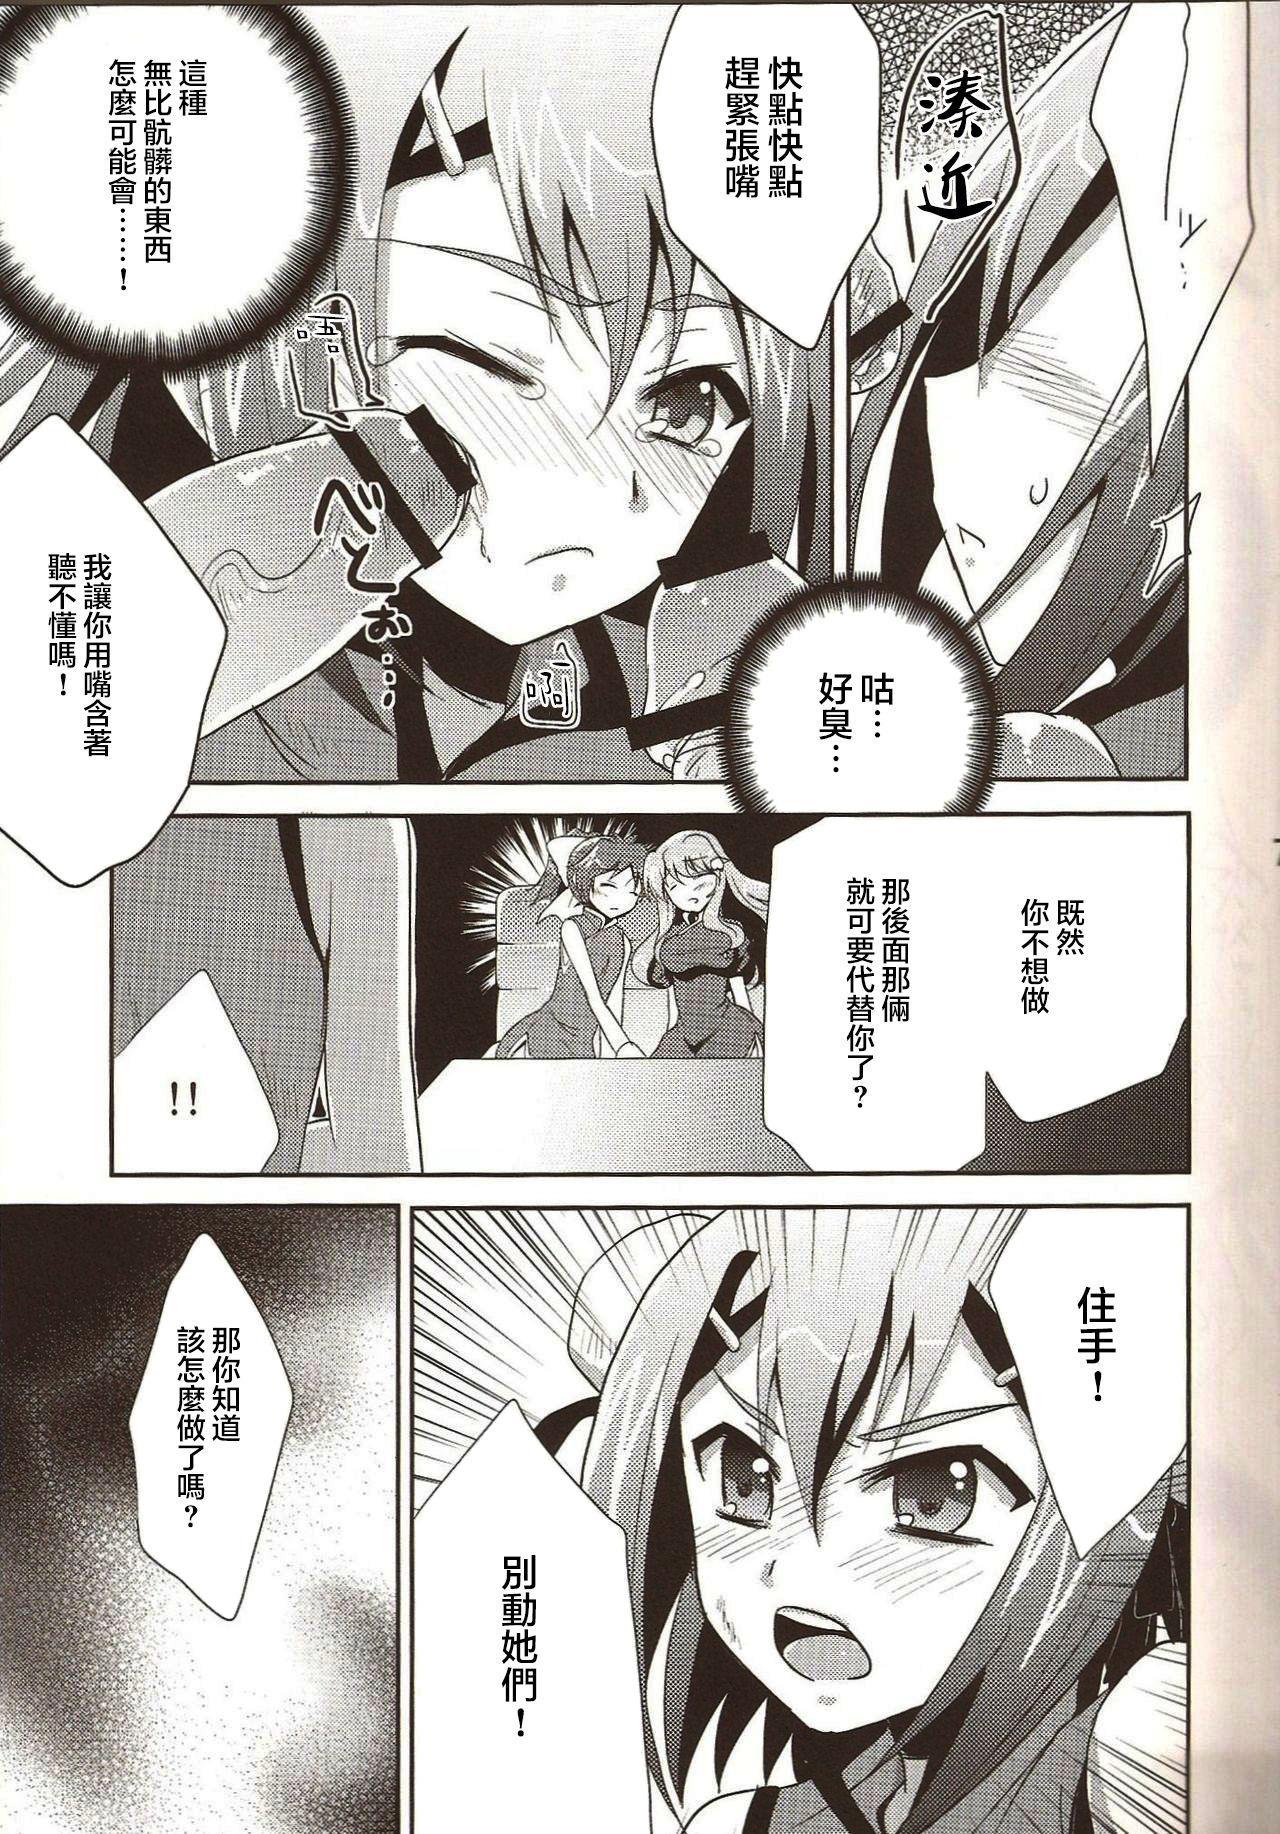 Hideyoshi Director's Cut 6